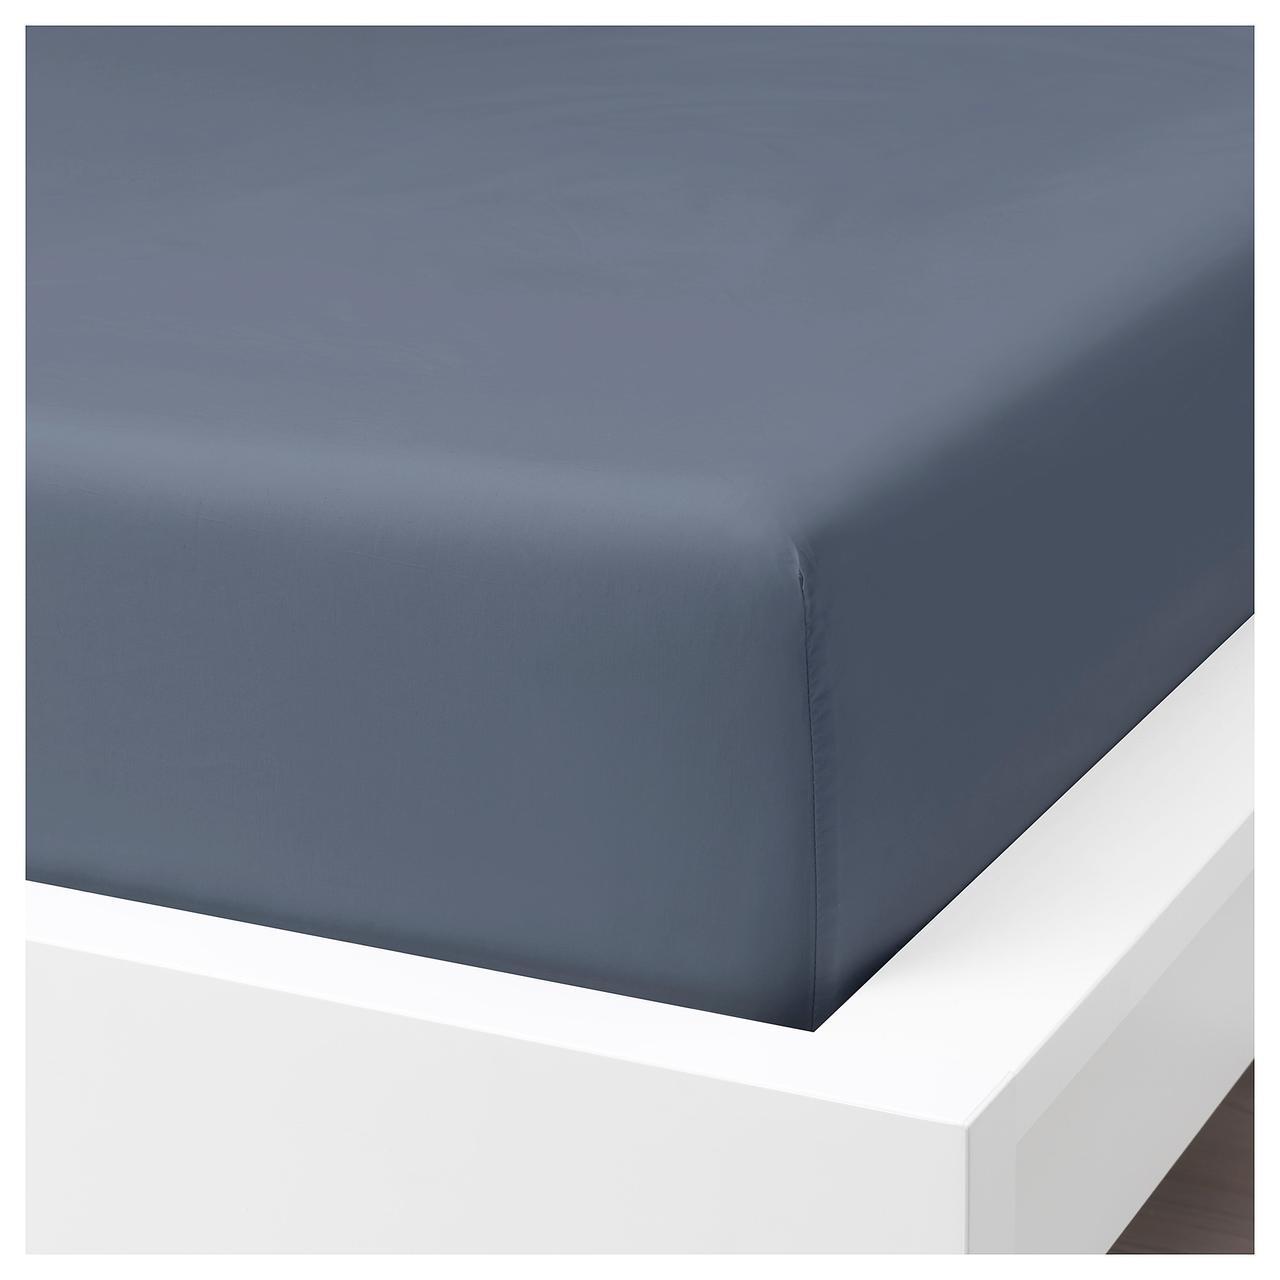 Простыня IKEA SÖMNTUTA 180х200 см на резинке темно-синяя 804.127.66